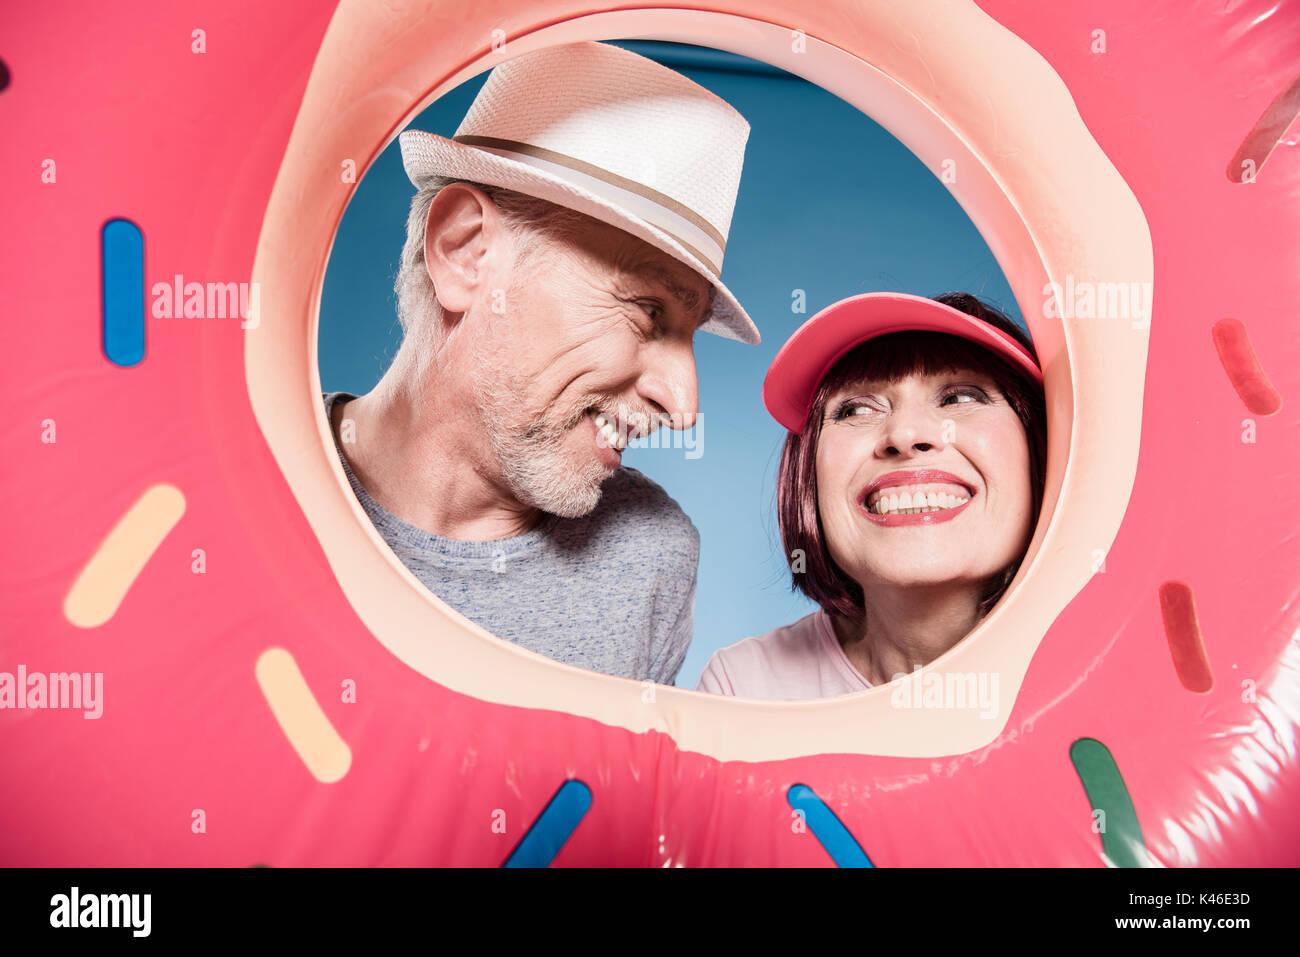 portrait of carefree elderly couple smiling into swimming tube - Stock Image